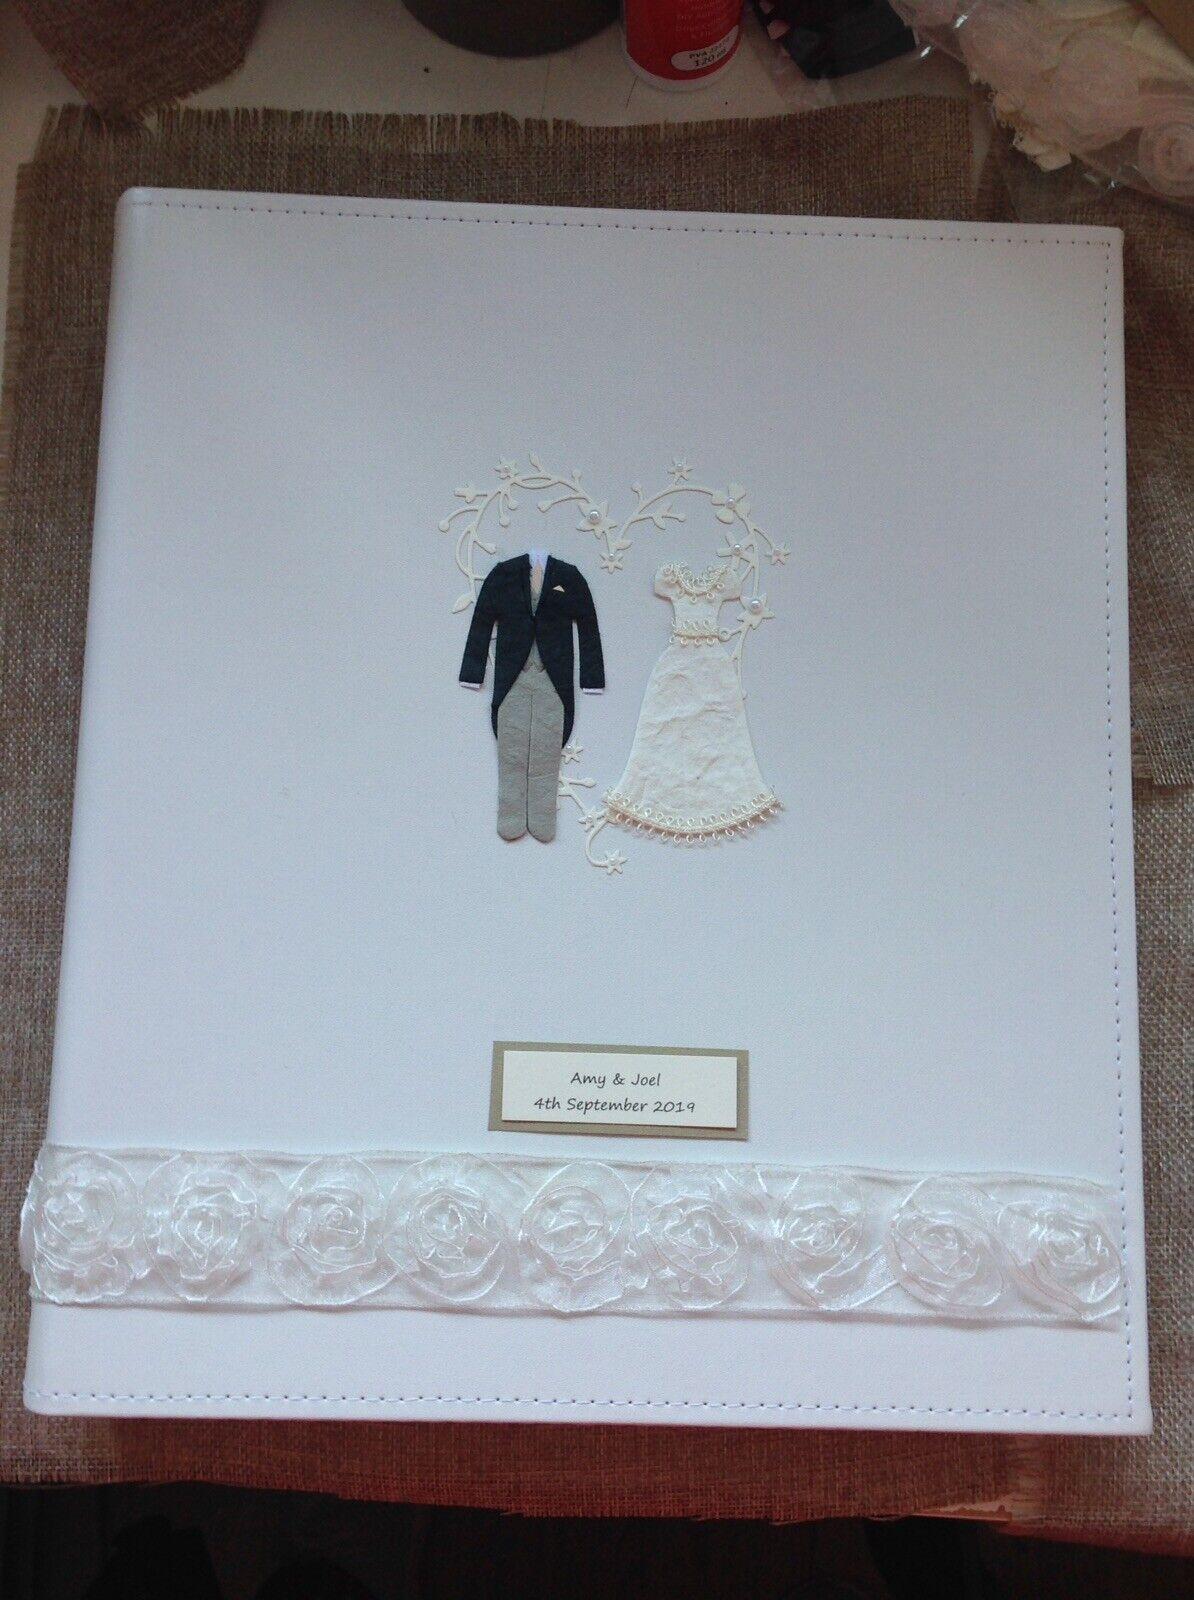 .LUXURYTraditional Wedding Photo Album, Tissue Interleaved Sheets., PERSONALISED